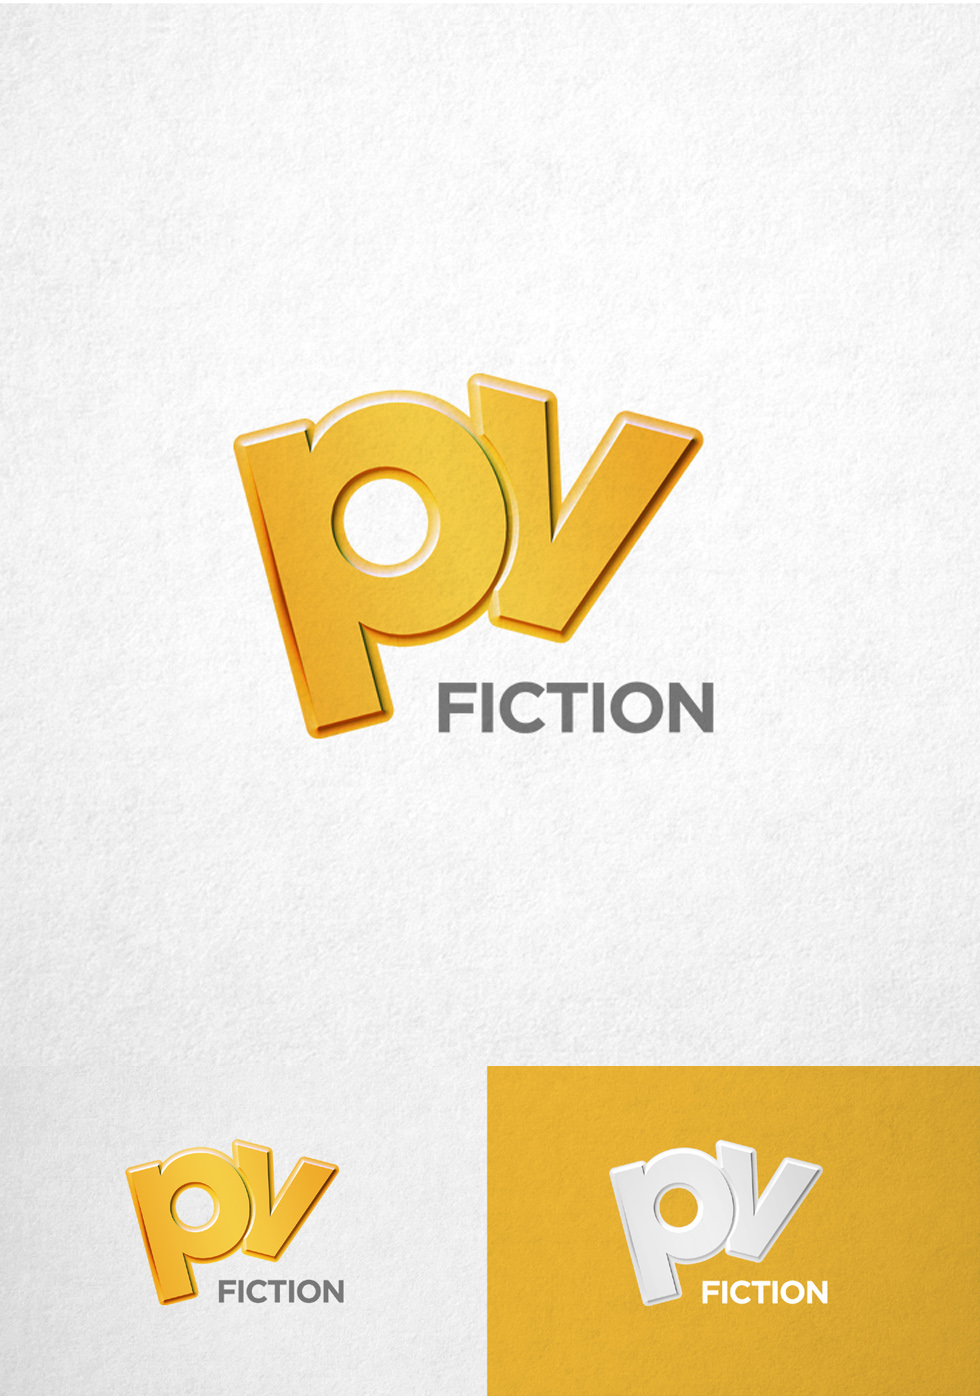 PV Fiction